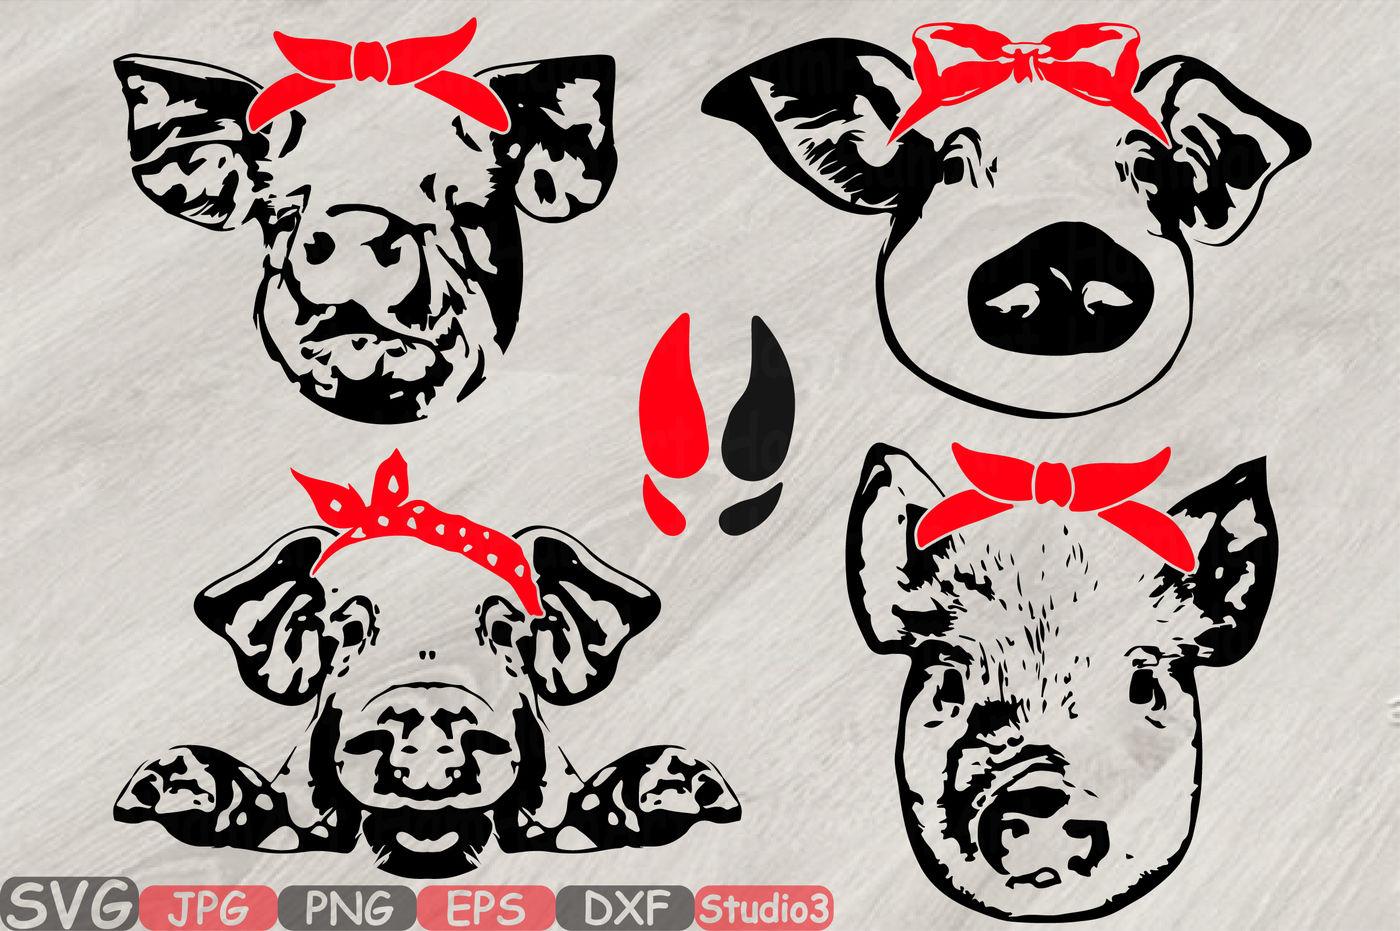 Pig Head Whit Bandana Silhouette Svg Feet Pigs Western Farm 825s By Hamhamart Thehungryjpeg Com